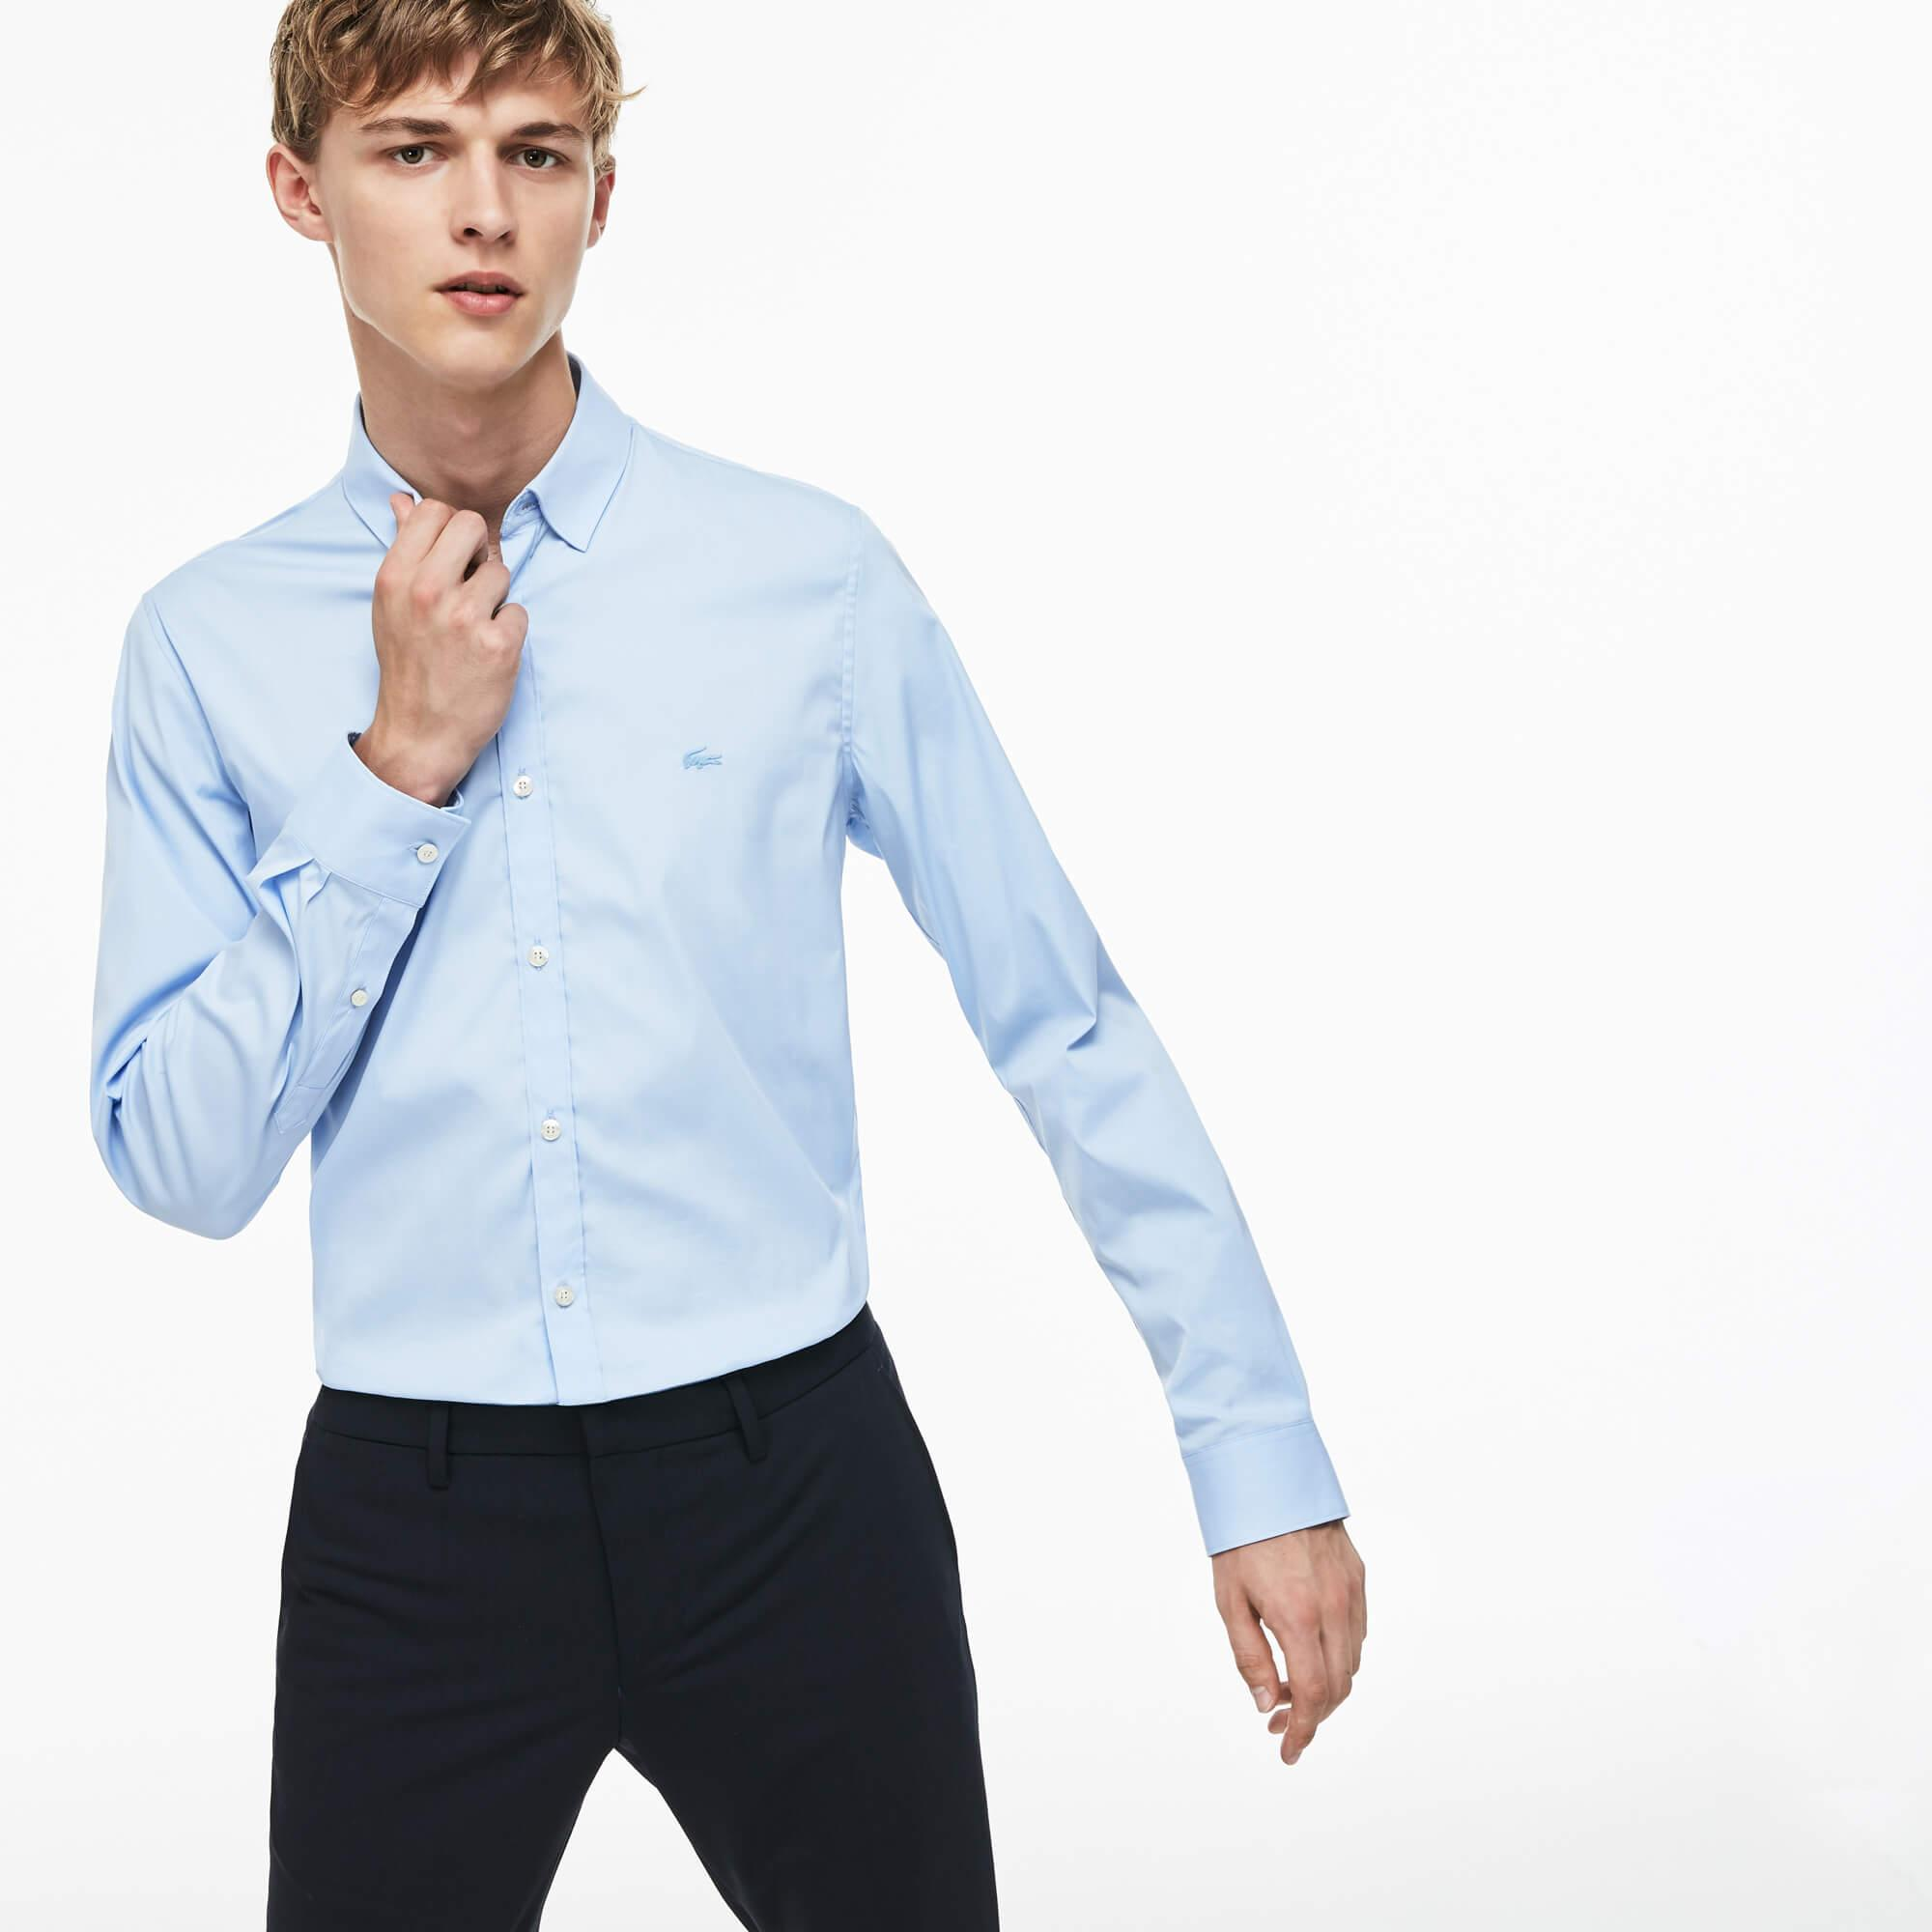 Lacoste Erkek Slim Fit Streç Poplin Pamuklu Mavi Gömlek